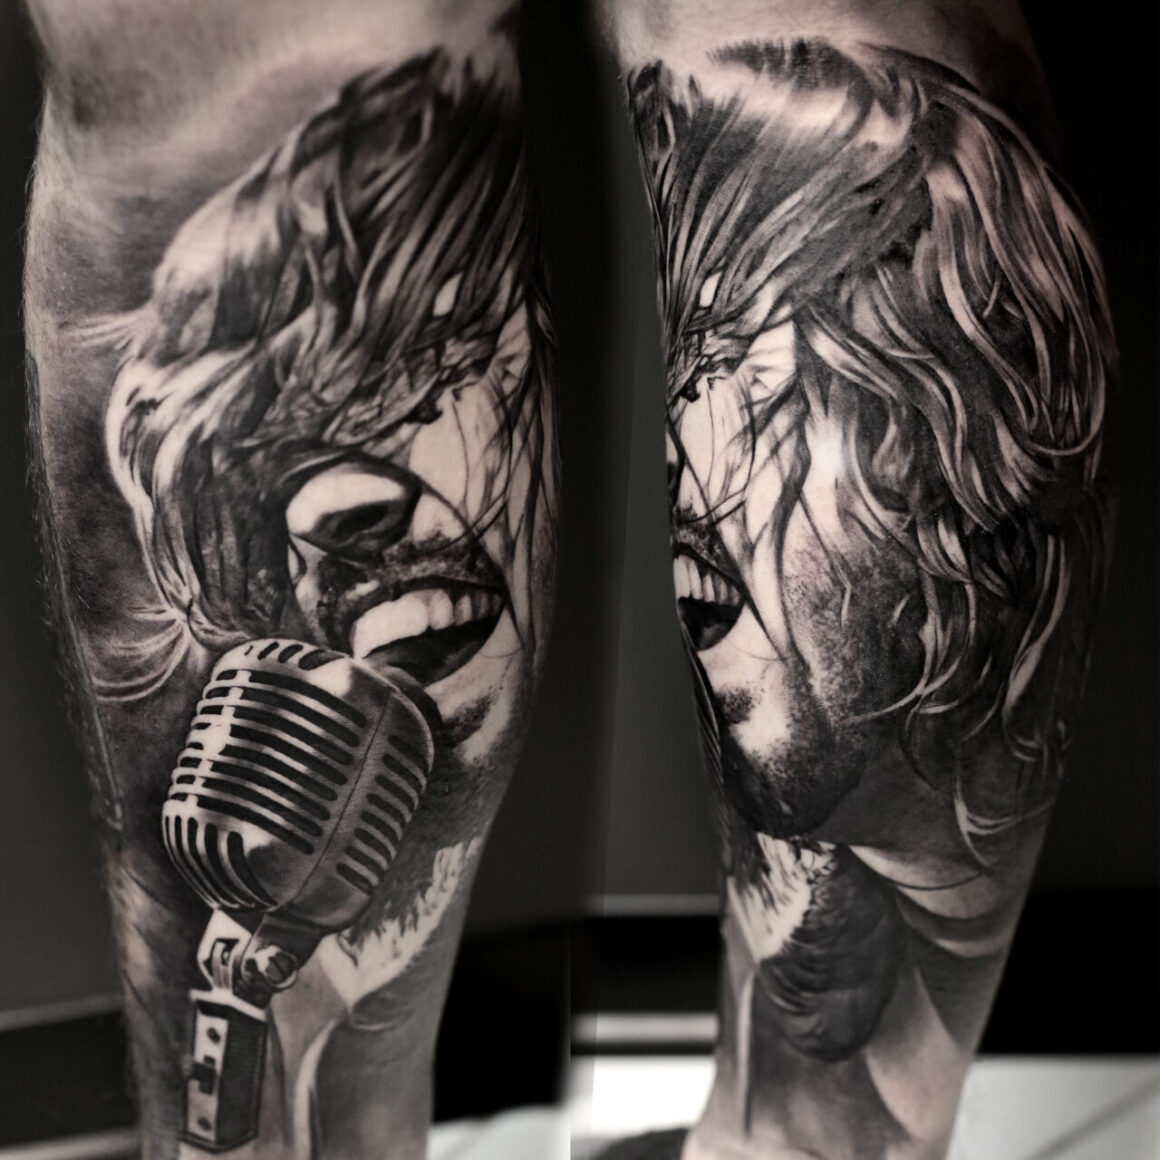 Matteo Pasqualin, Artigiano Tatuatore Tattoo Collective, Brembate, Italy